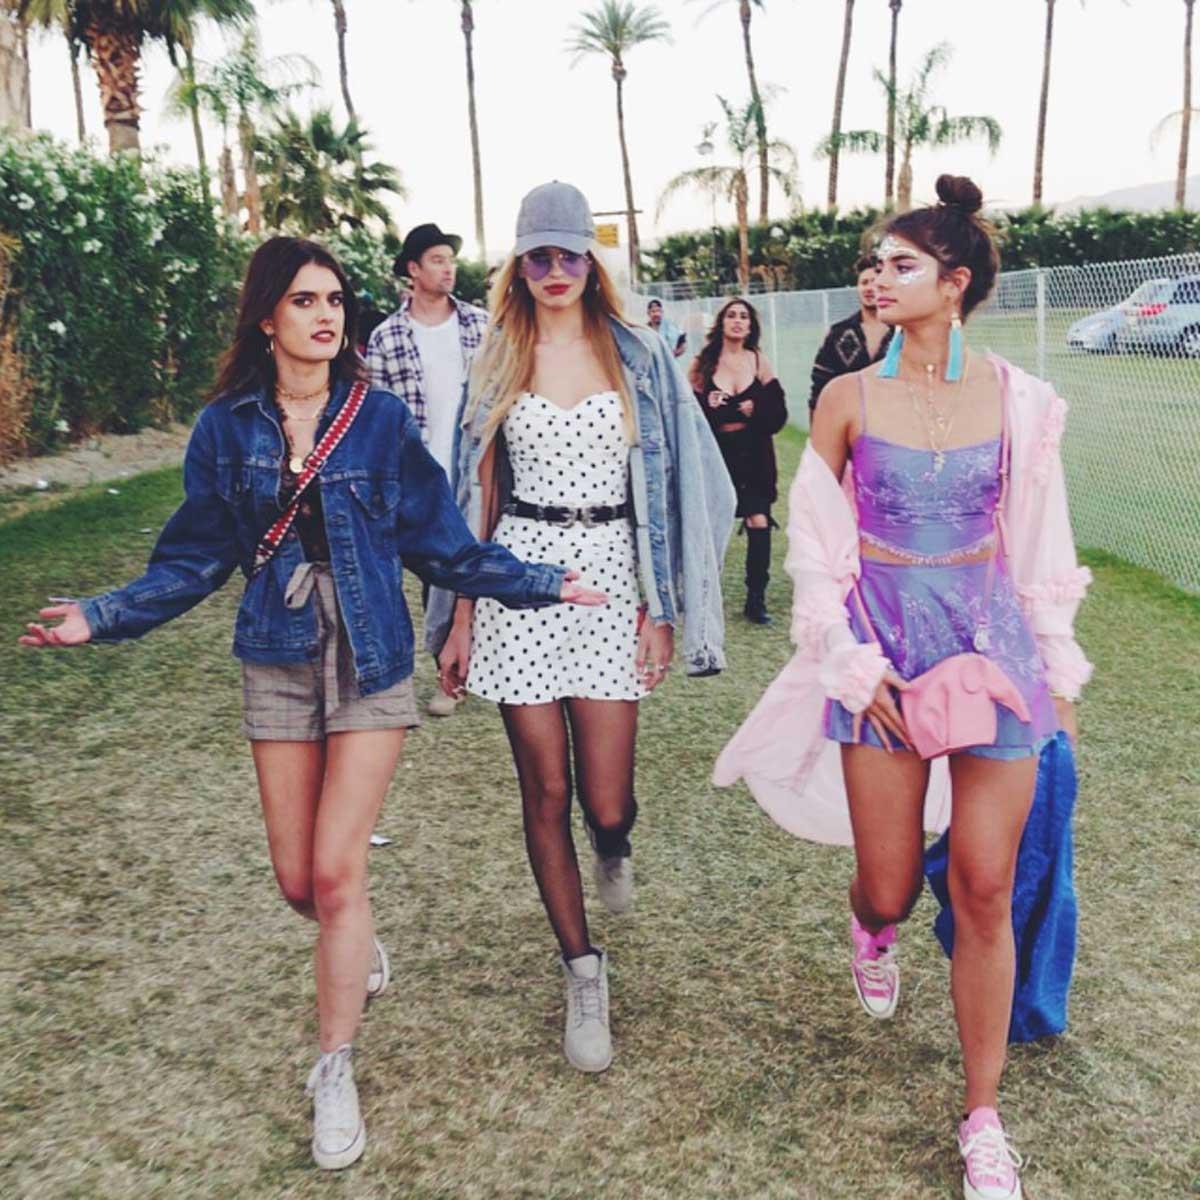 Festival outfit ideas 2020